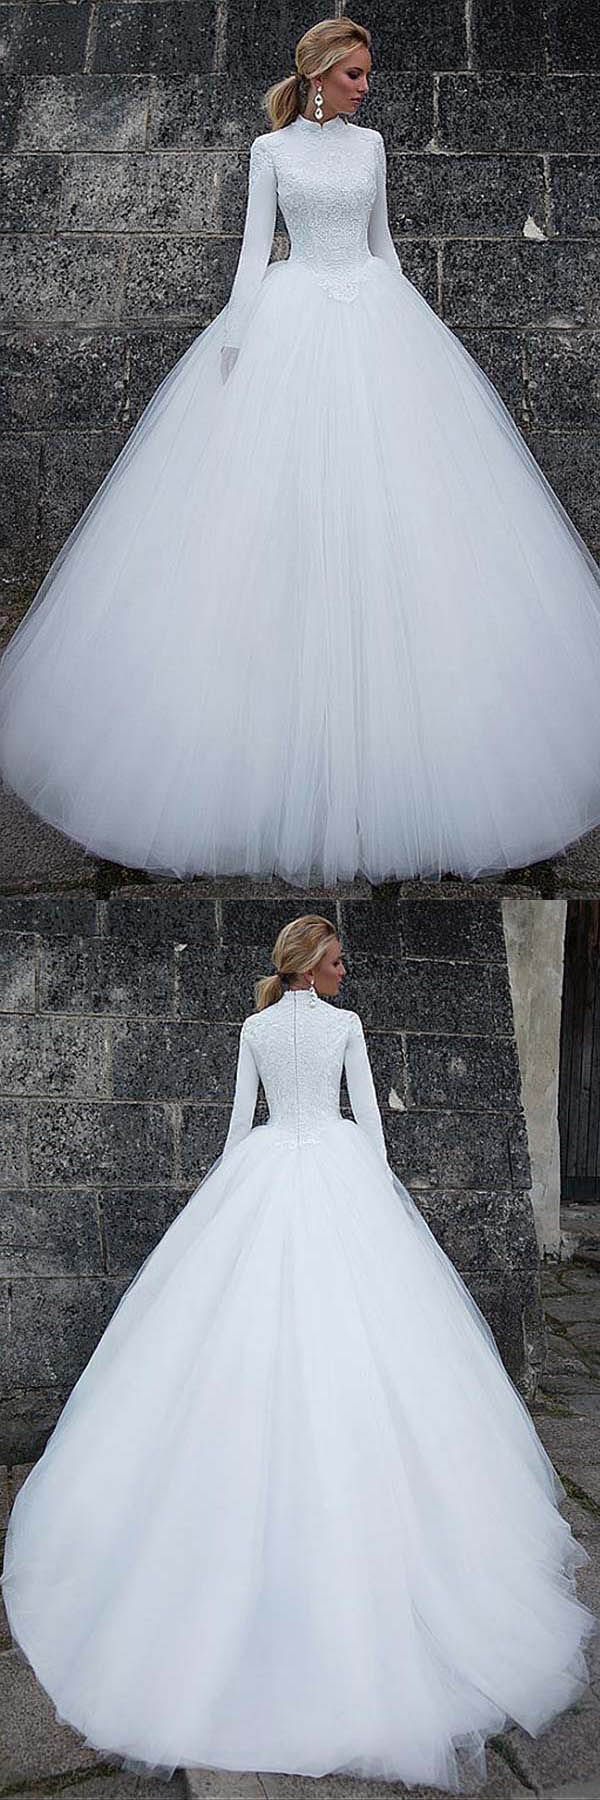 #weddingdress #weddings #dress #ballgown #satin #2018wedding